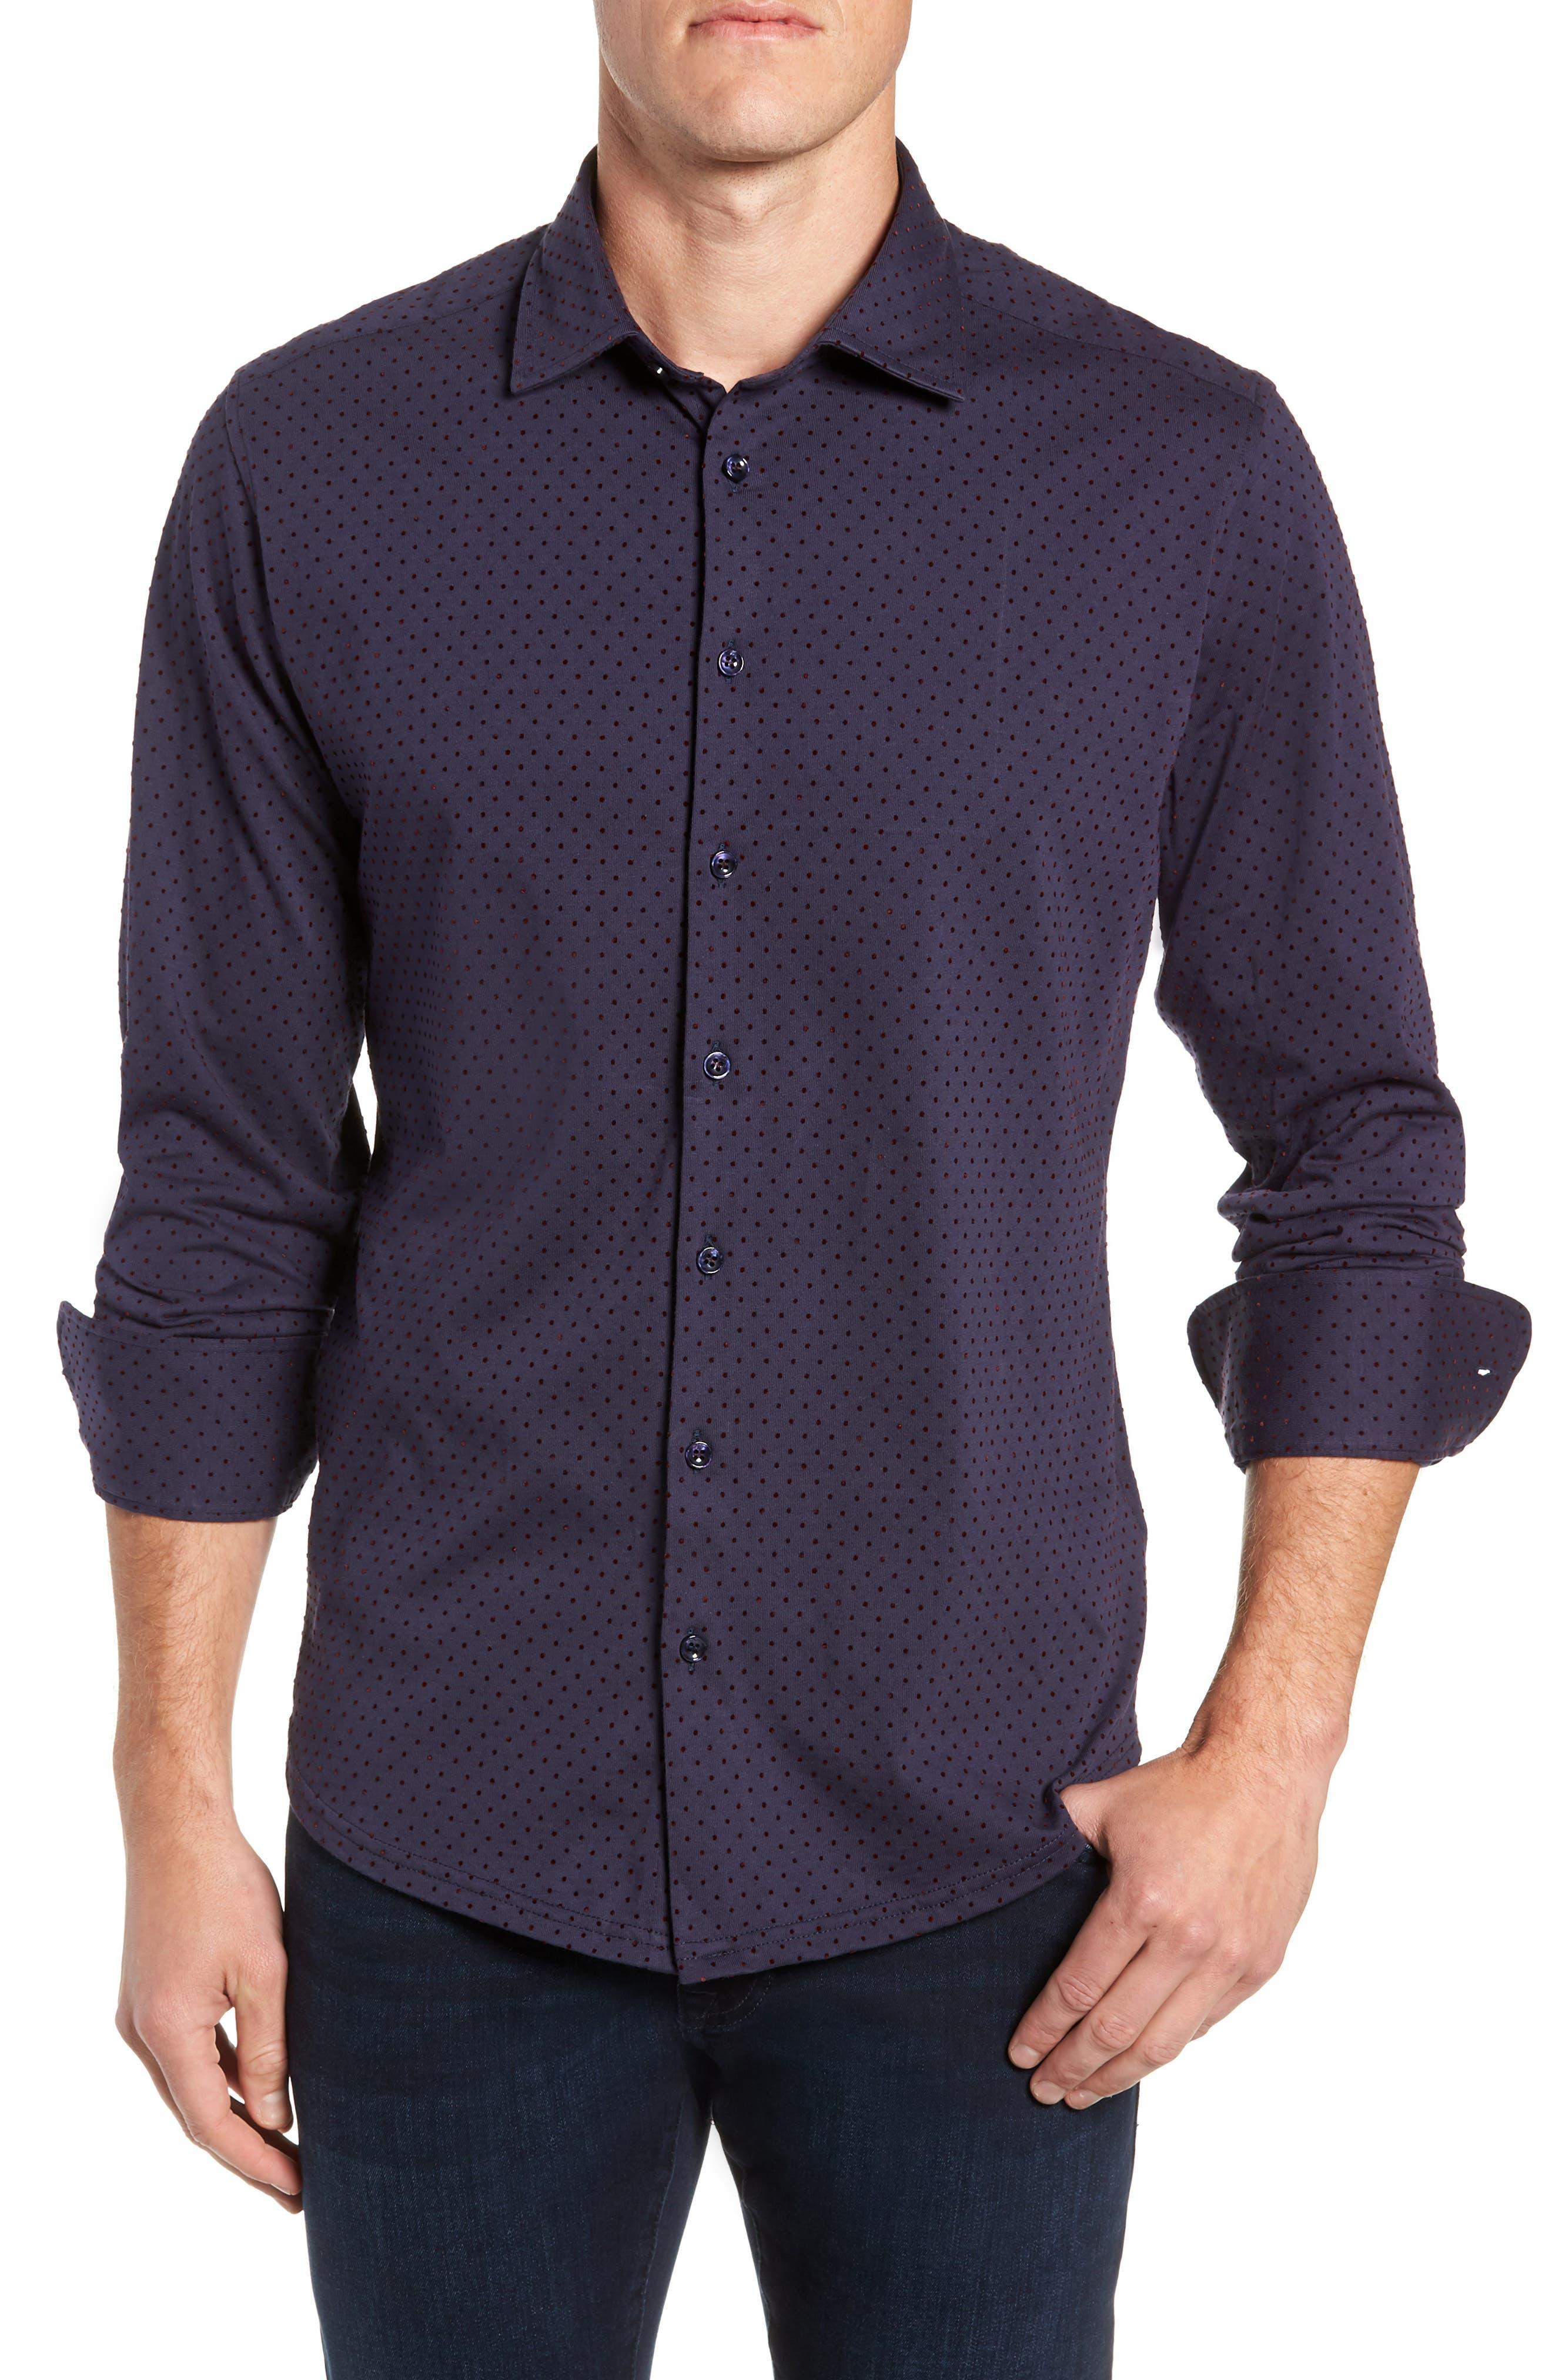 STONE ROSE,                             Regular Fit Knit Sport Shirt,                             Main thumbnail 1, color,                             NAVY